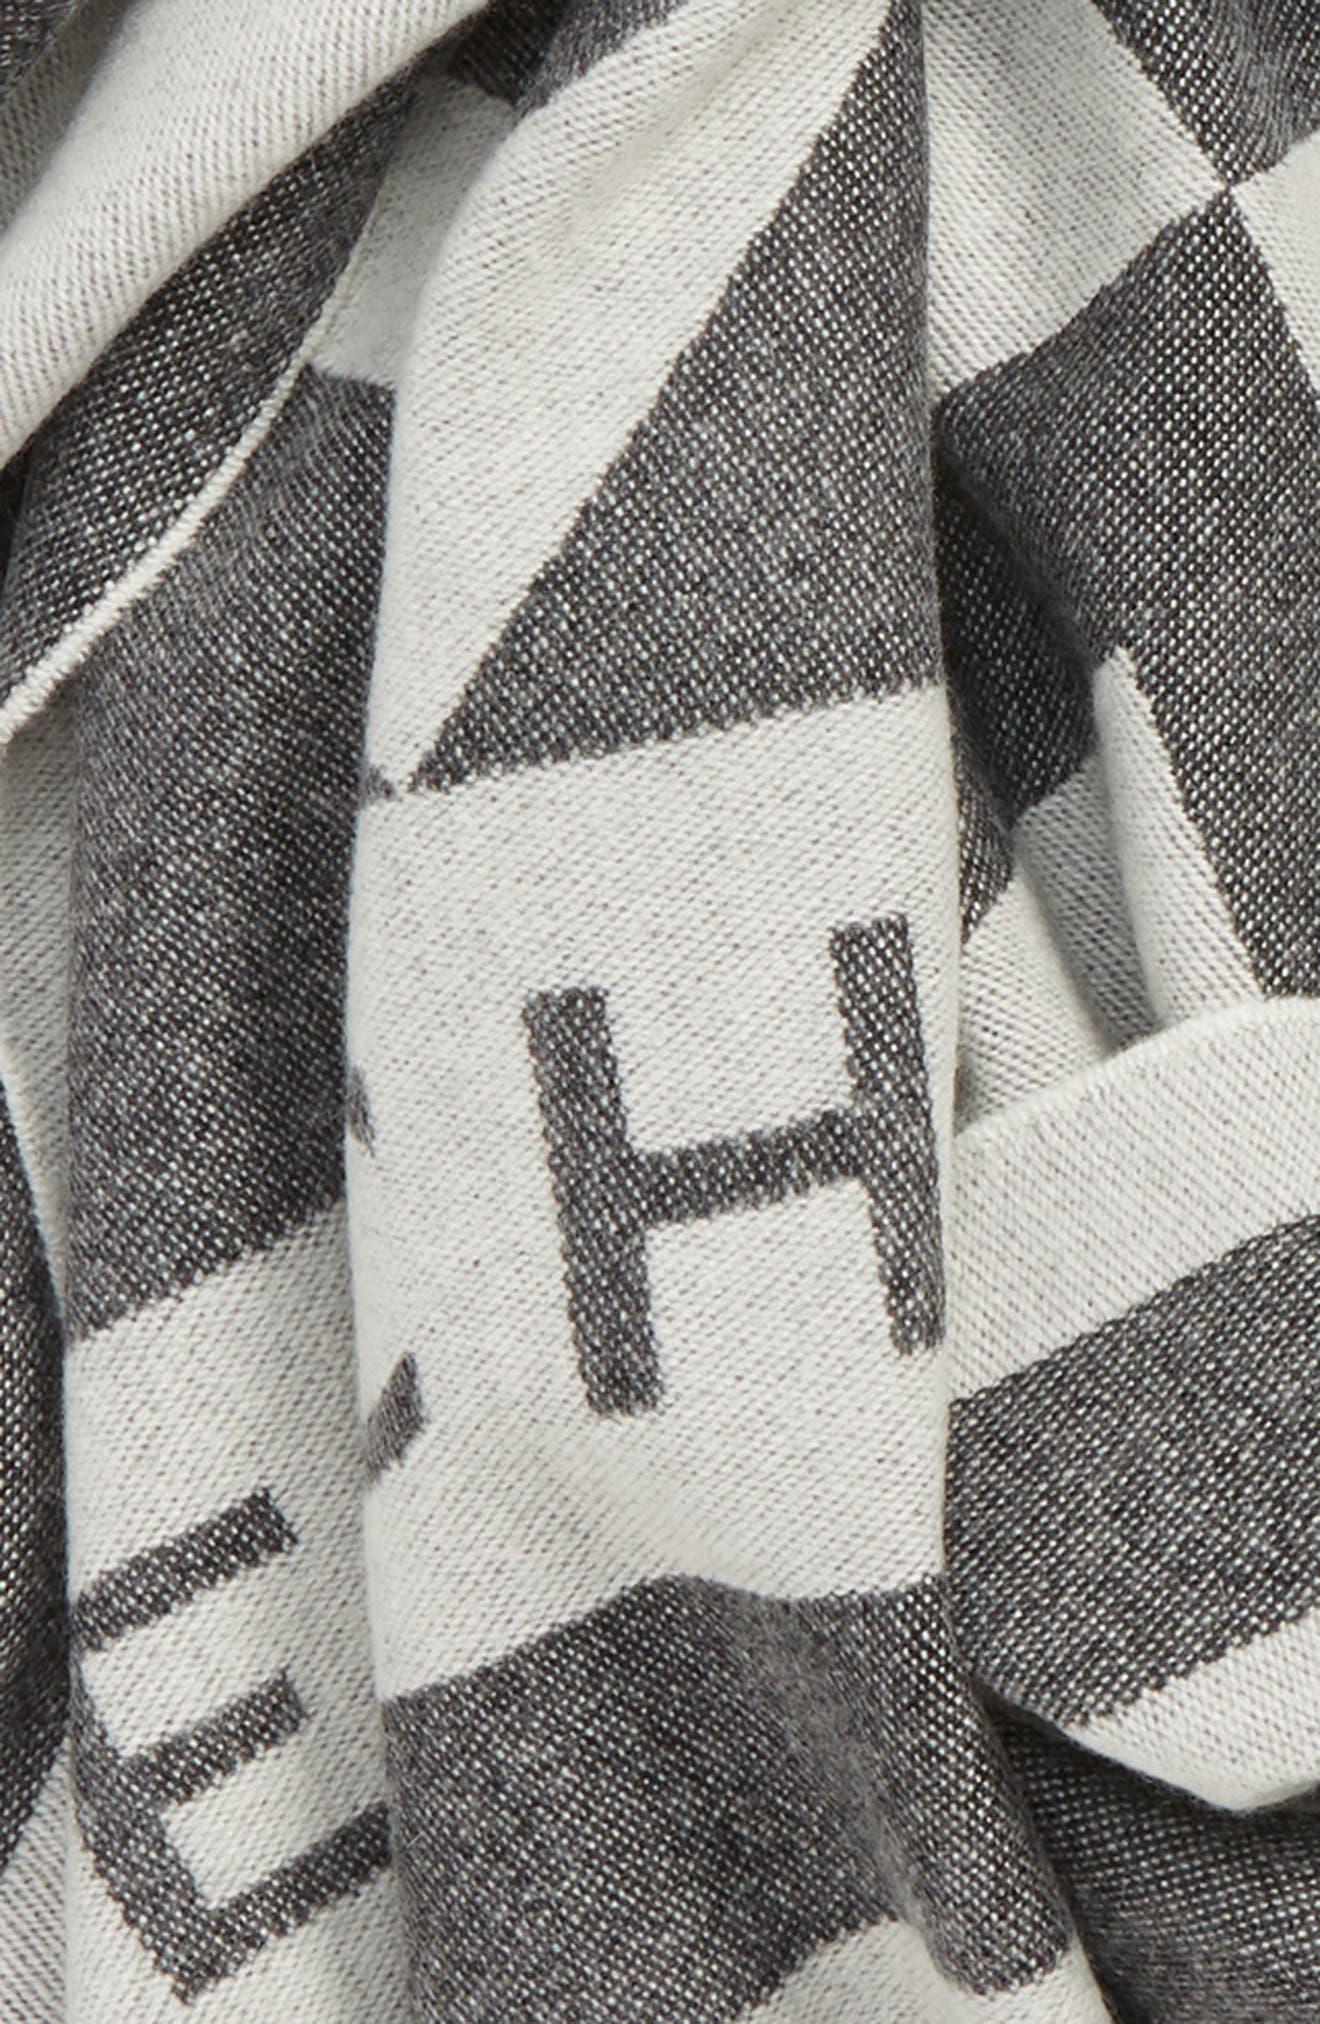 GIVENCHY,                             Nouveau G Wool & Cashmere Scarf,                             Alternate thumbnail 4, color,                             BLACK/ WHITE